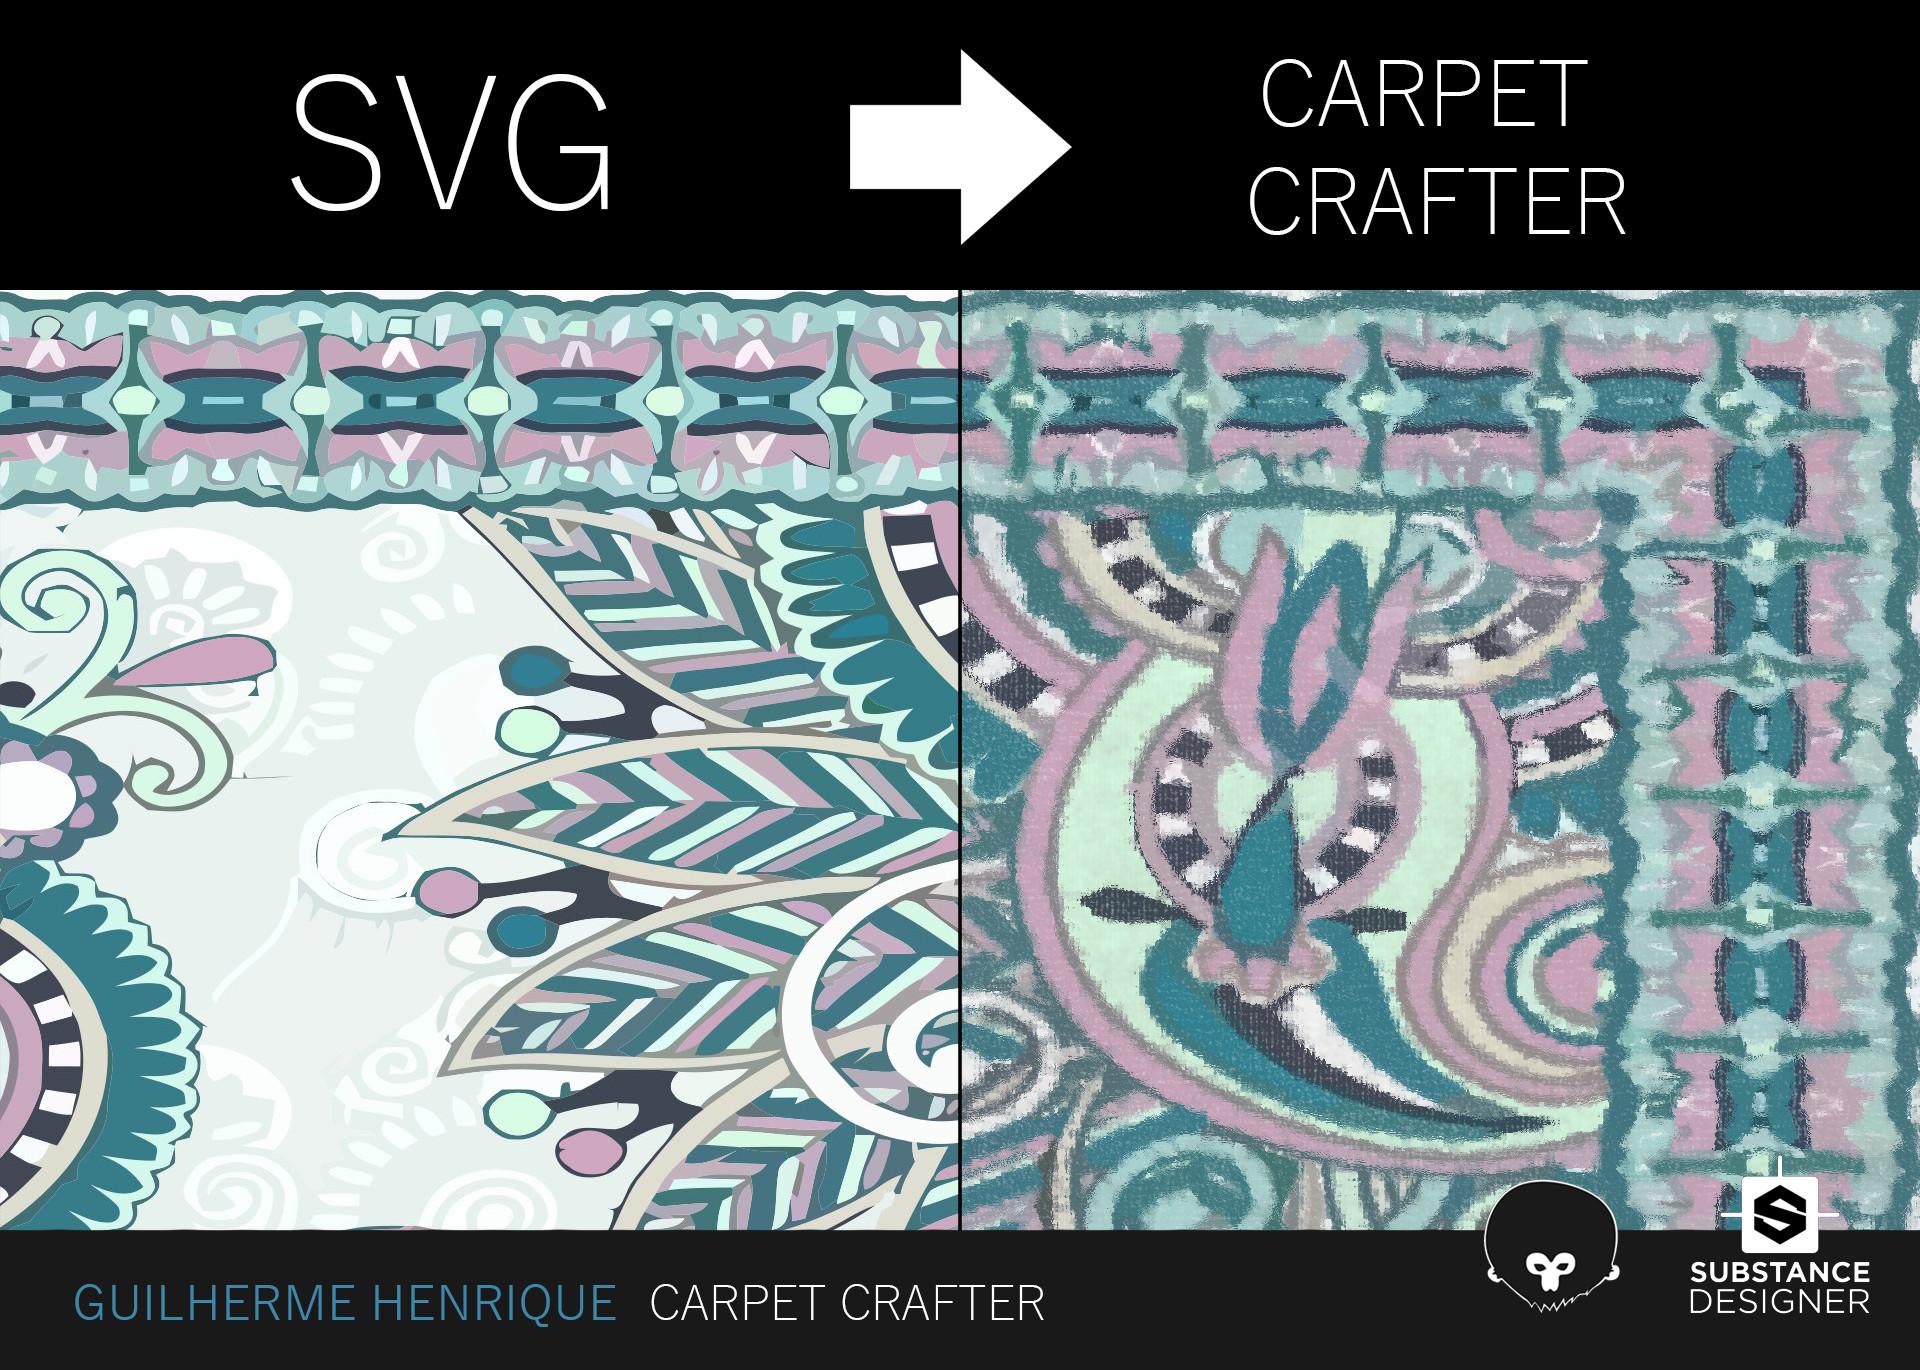 Guilherme henrique carpet crafter 1